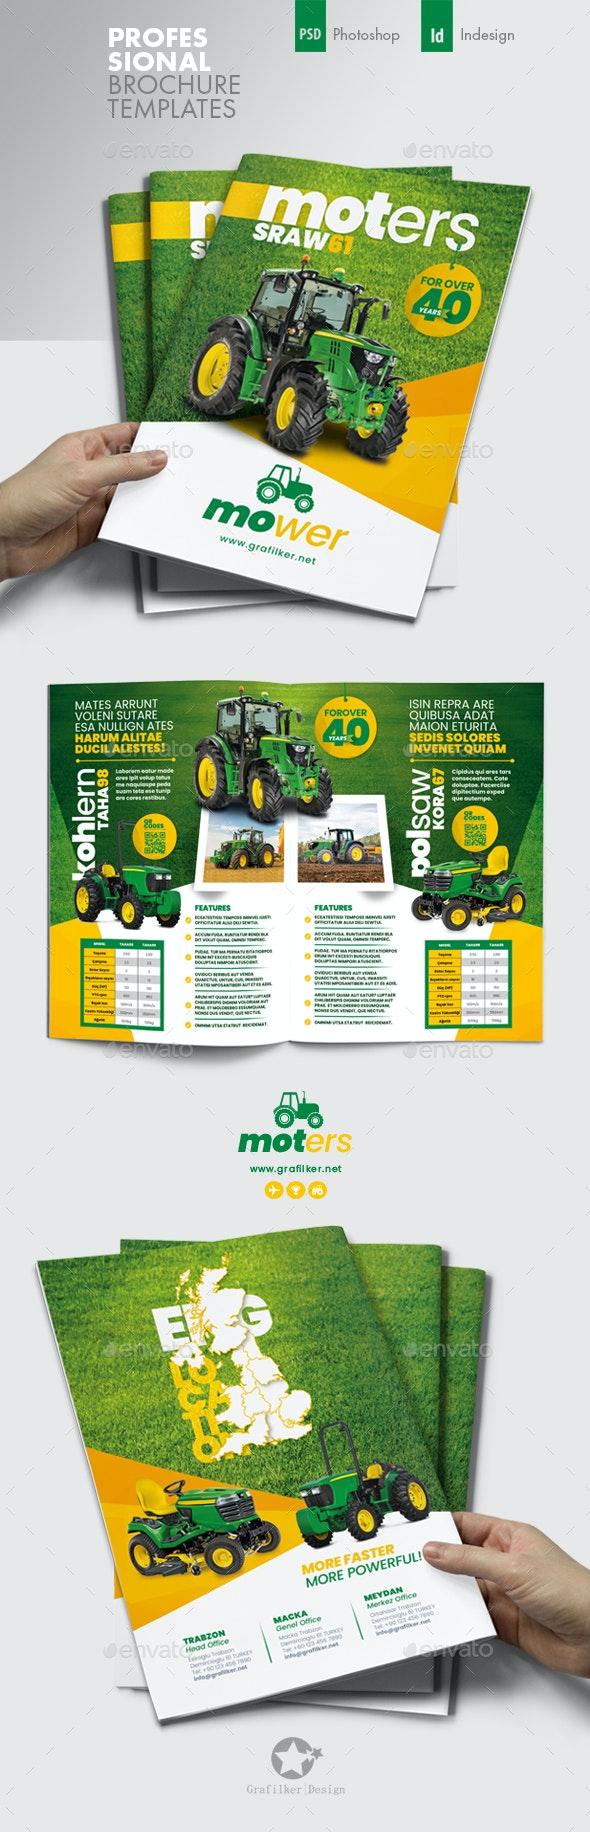 Vehichle Mower Brochure Templates - Corporate Brochures